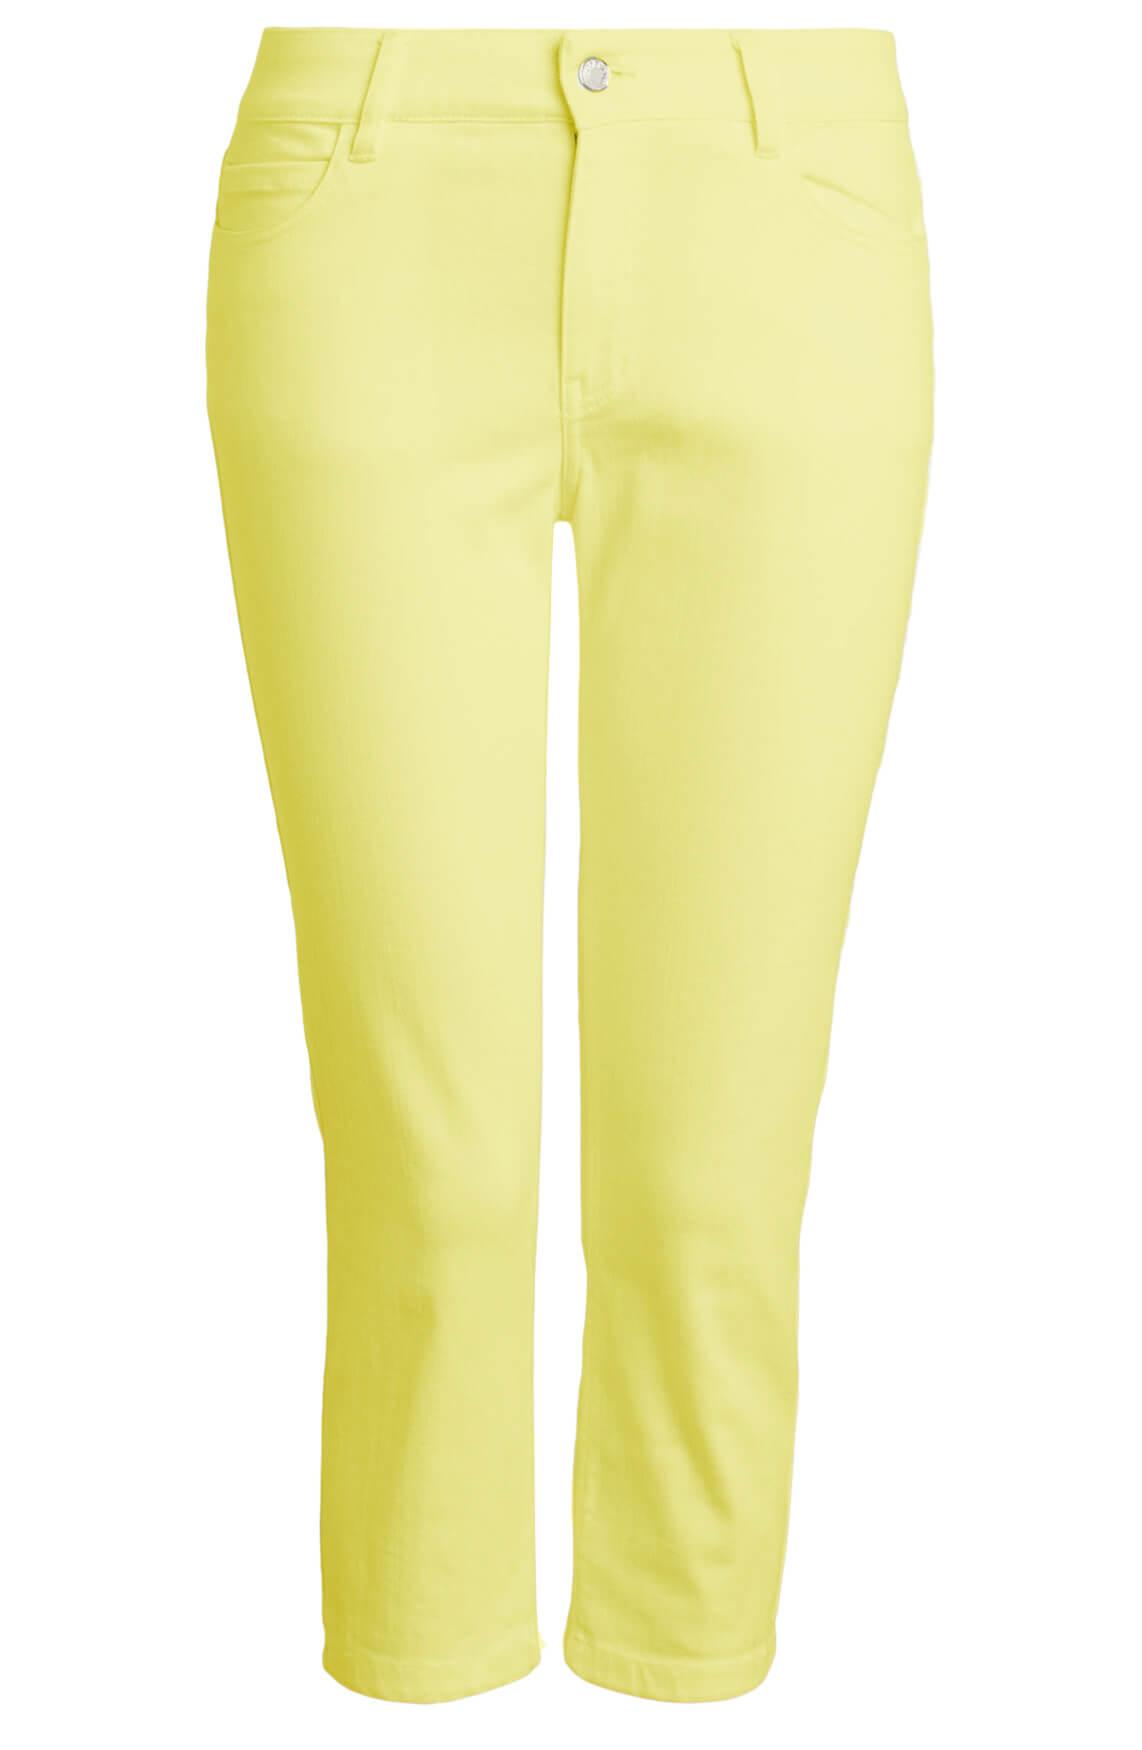 Anna Dames Capri broek geel